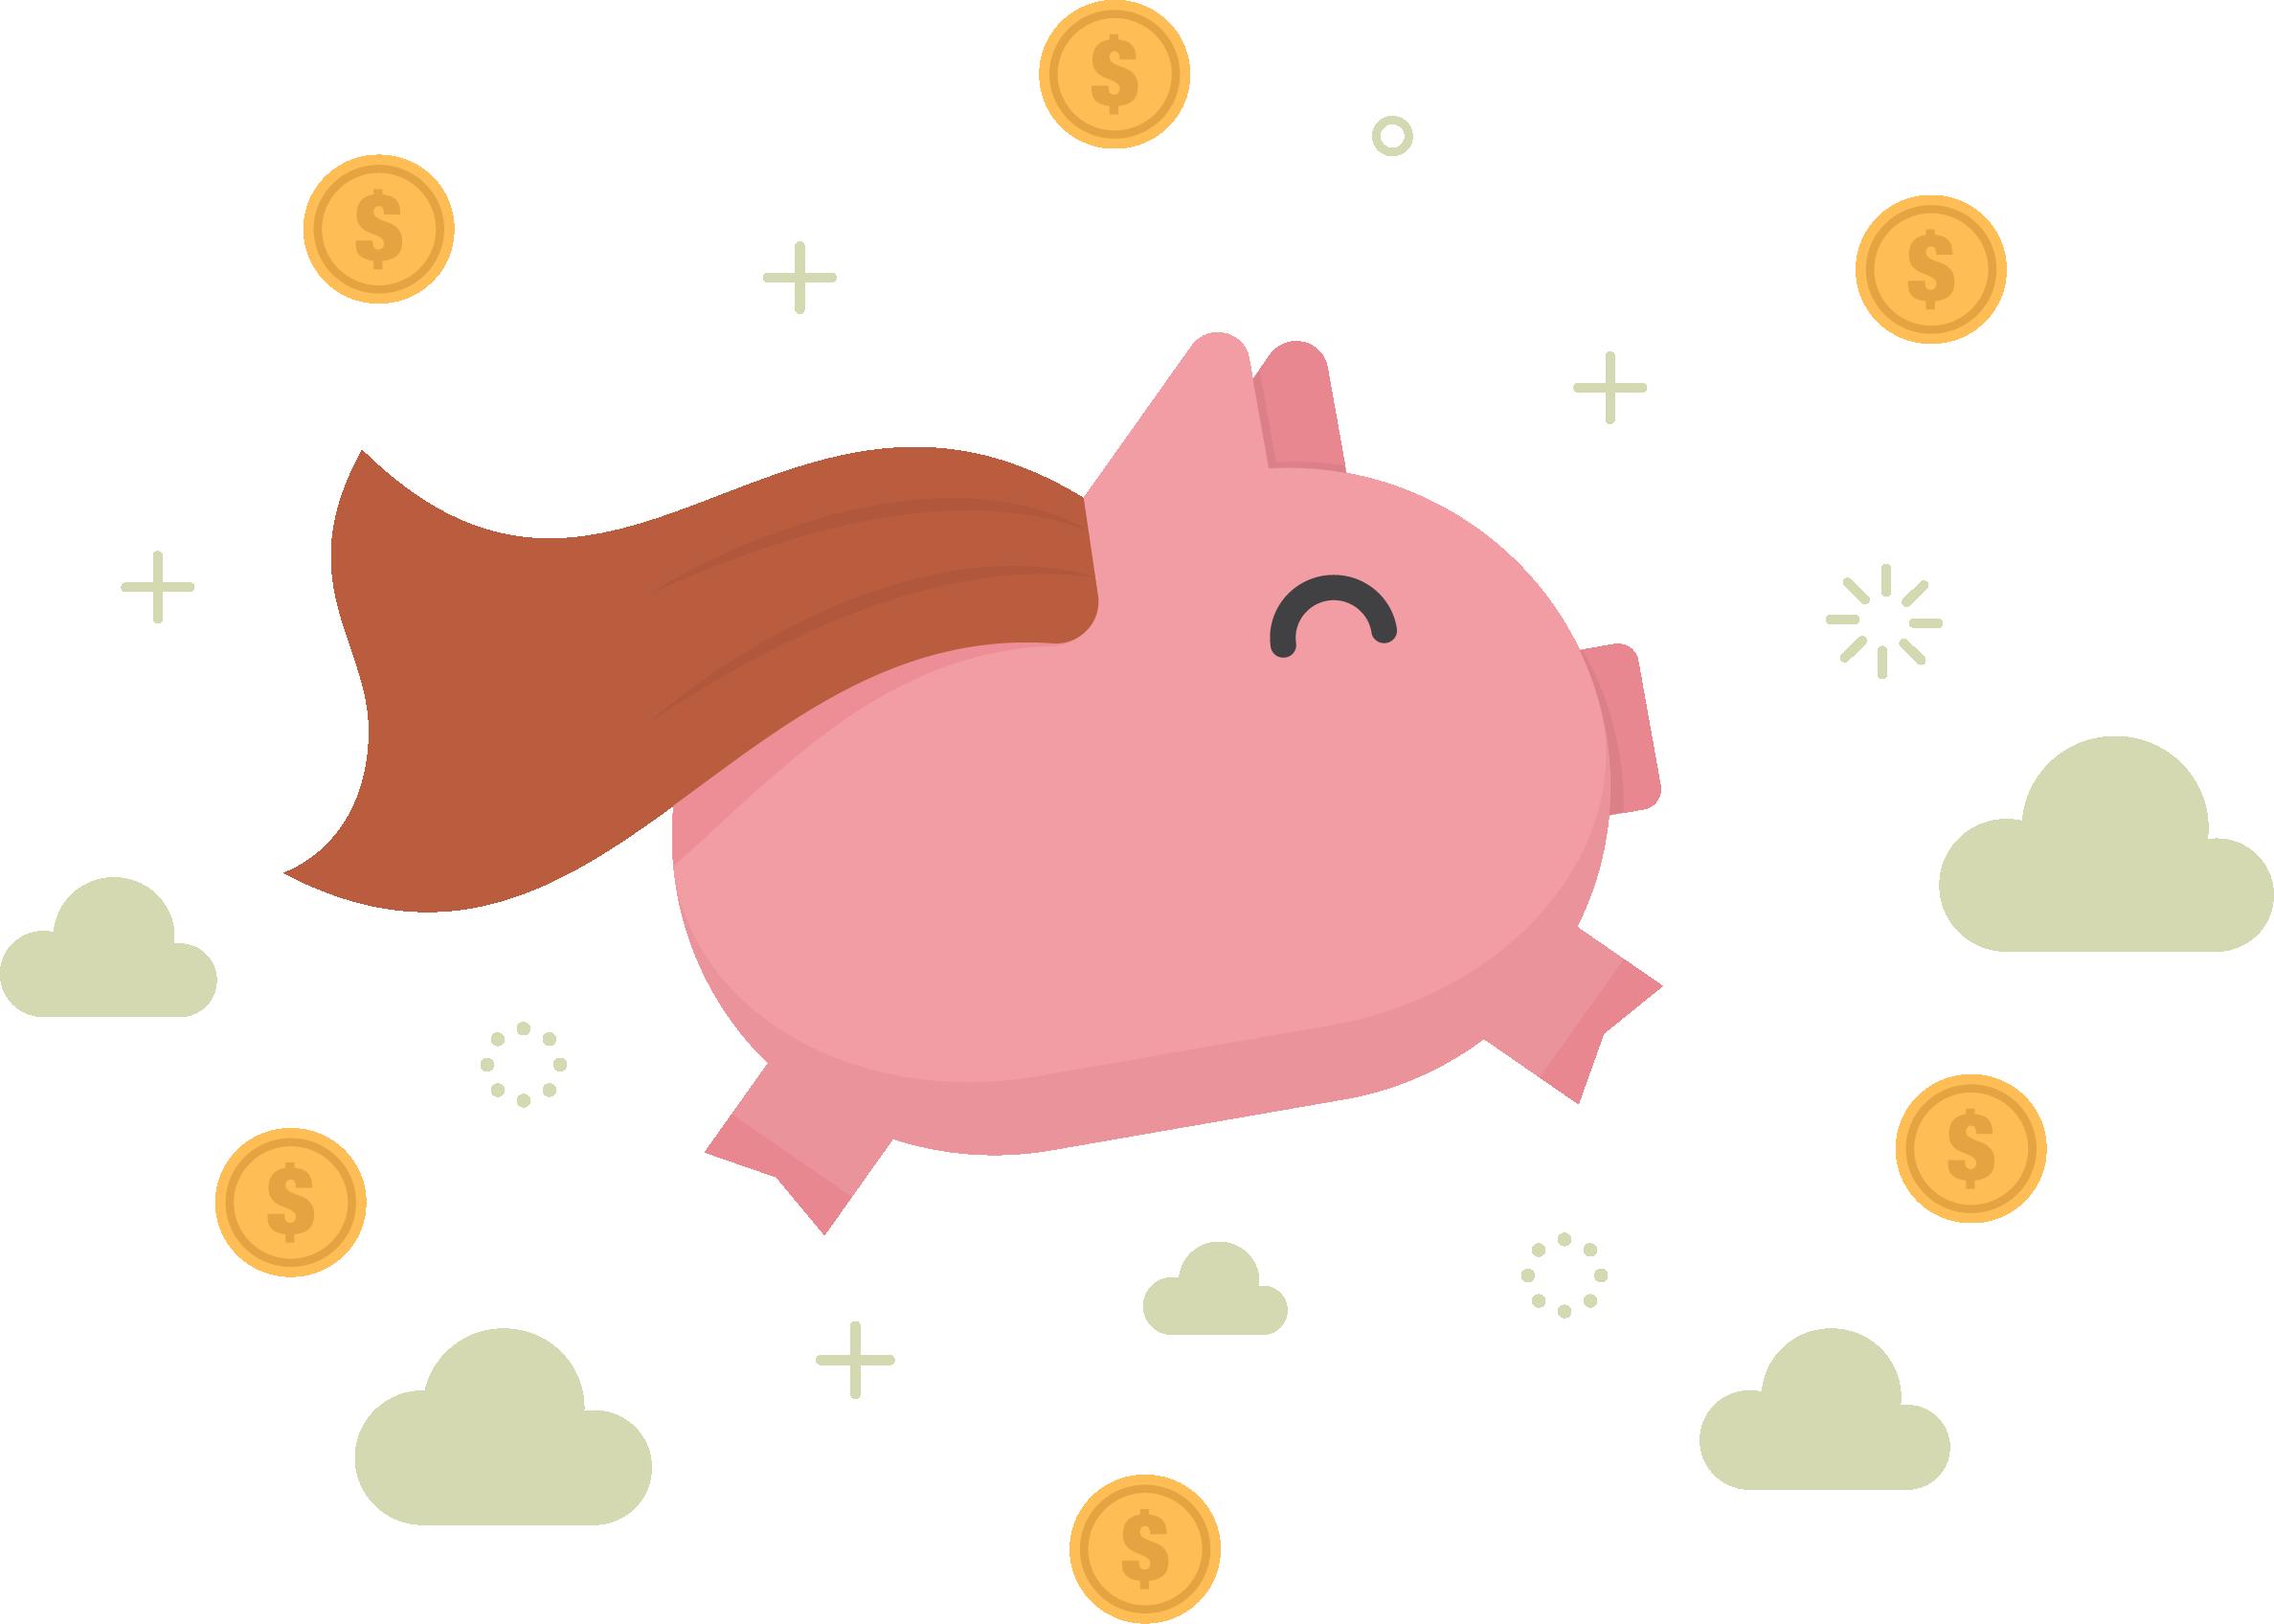 clipart royalty free stock Bank clipart england bank. Piggy money clip art.